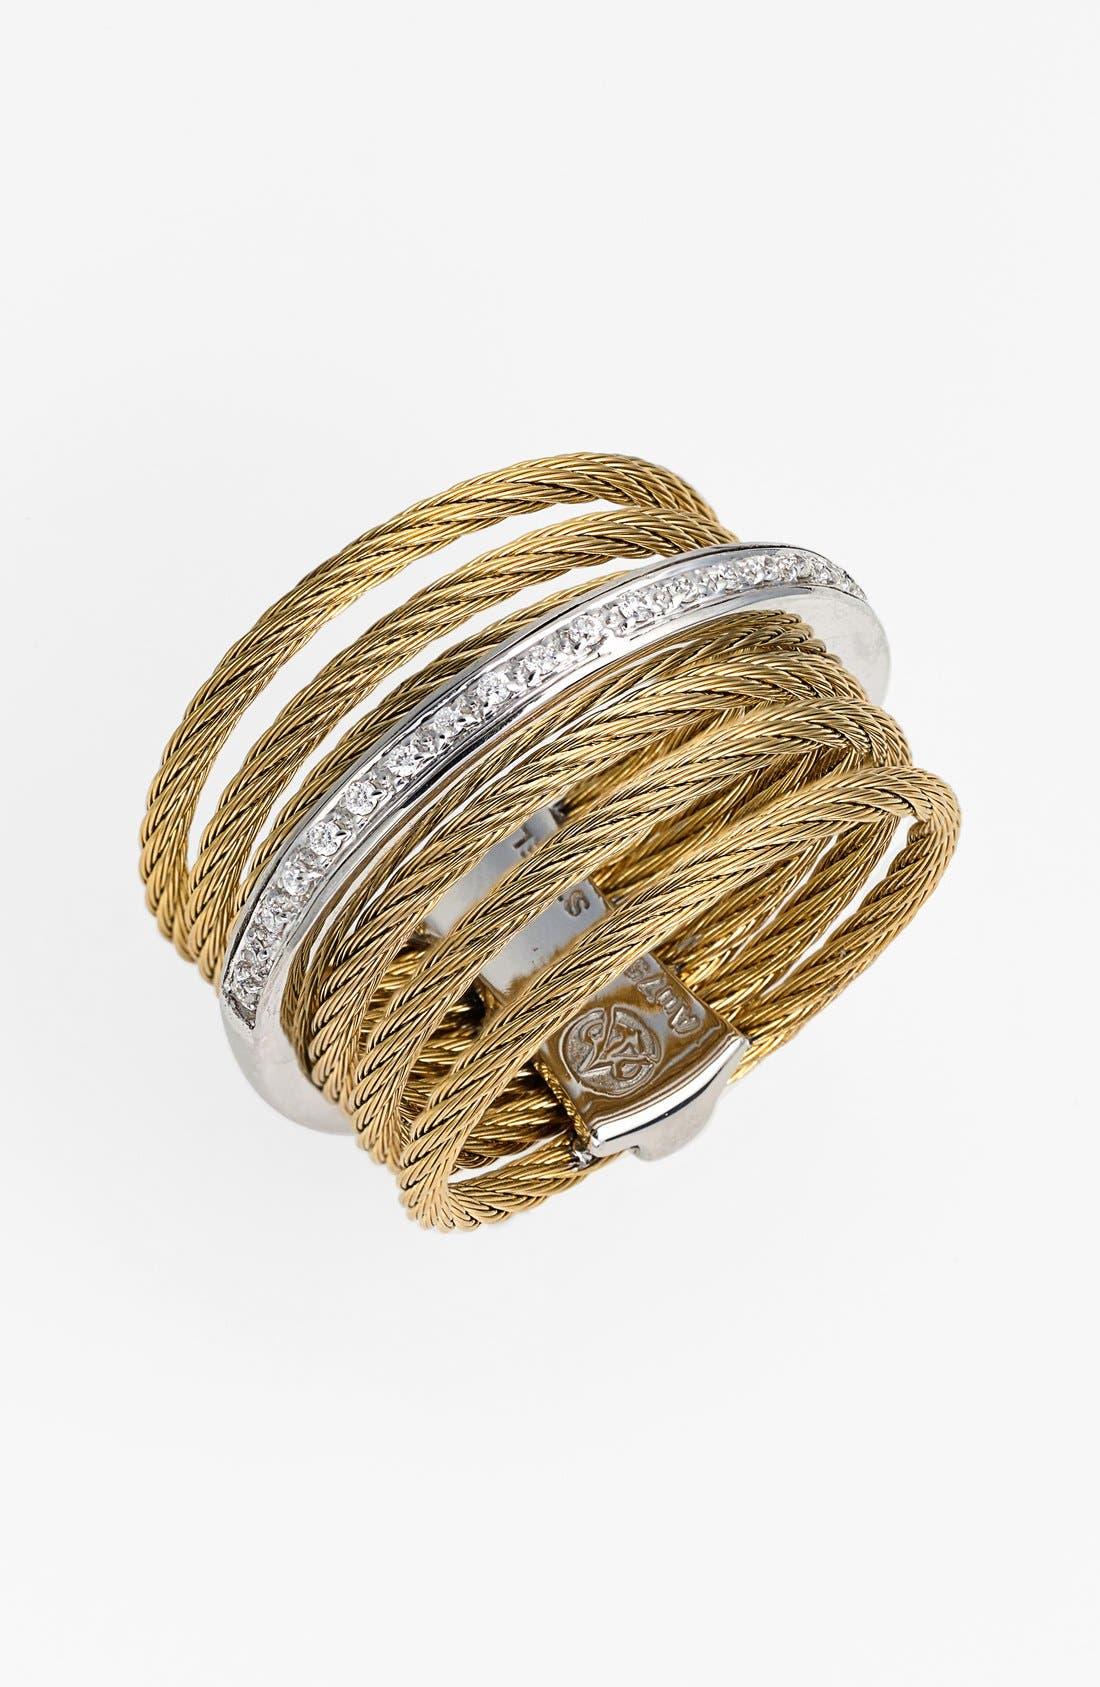 Main Image - ALOR® 7-Row Cable & Diamond Ring